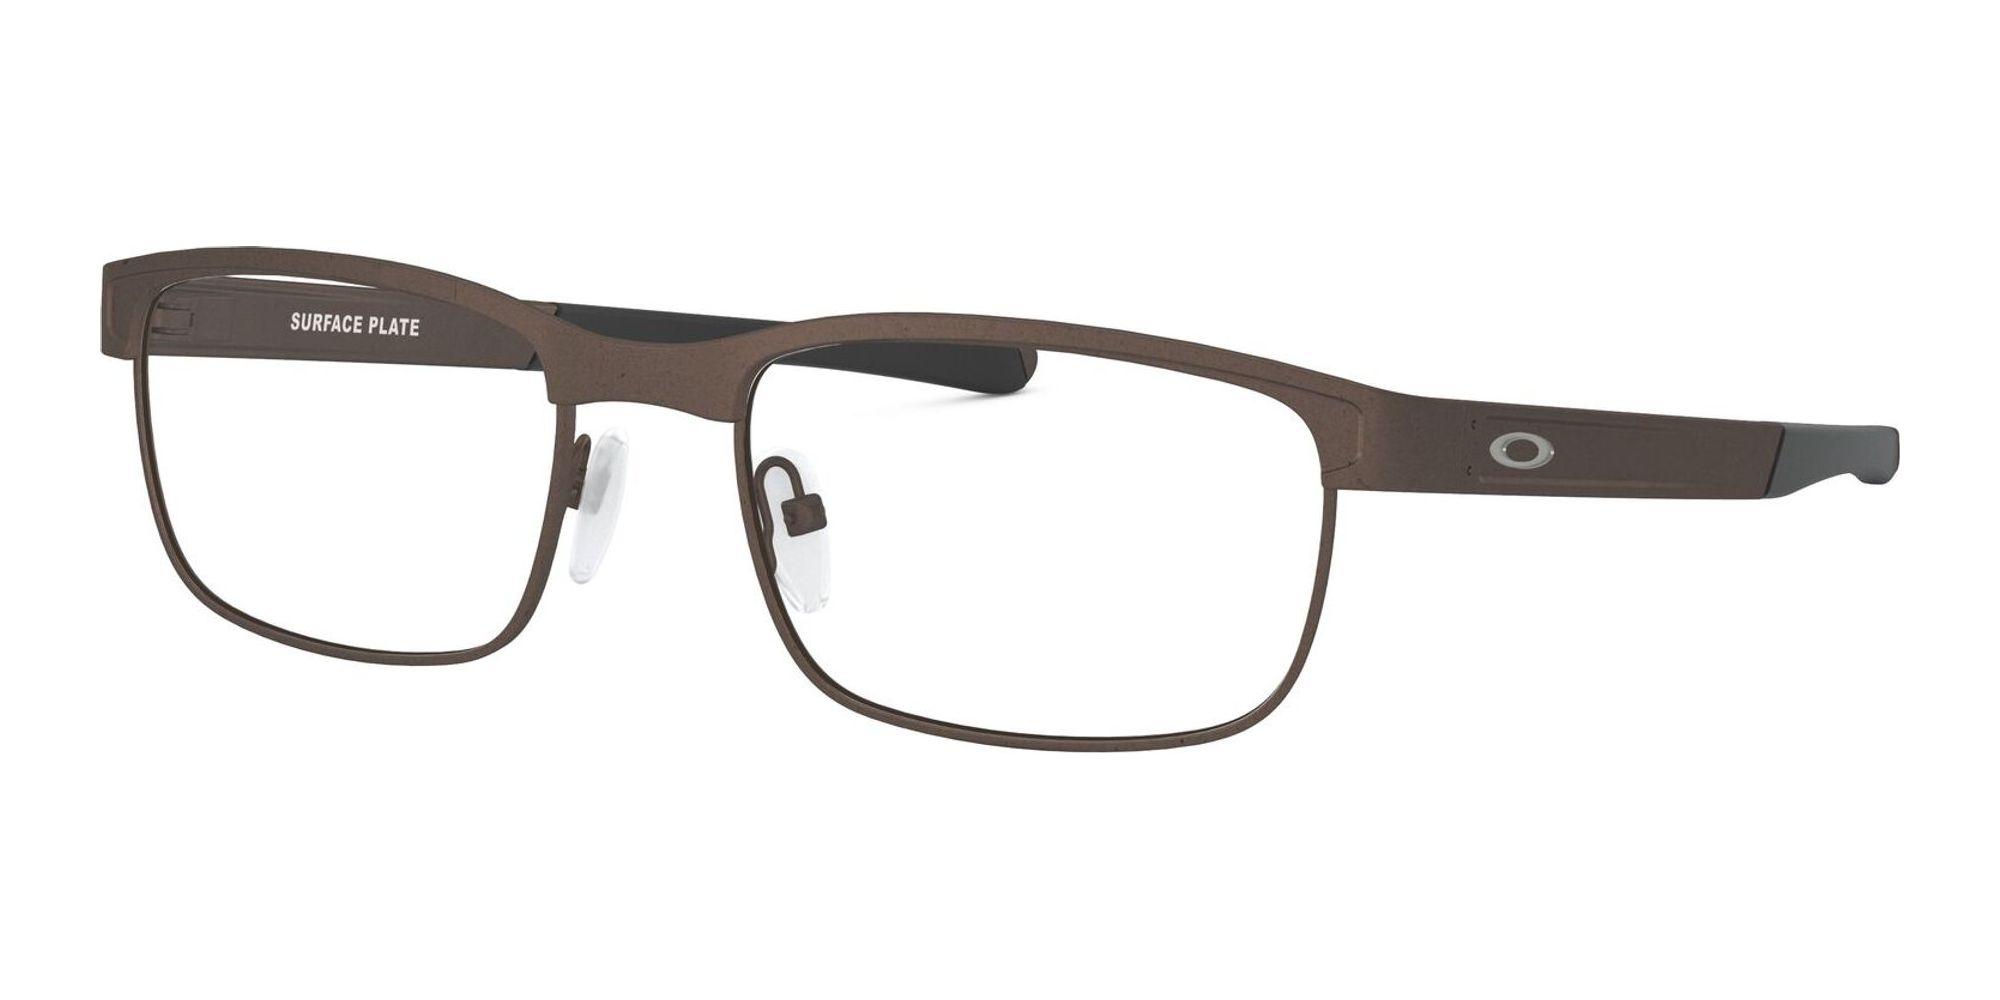 Oakley briller SURFACE PLATE OX 5132